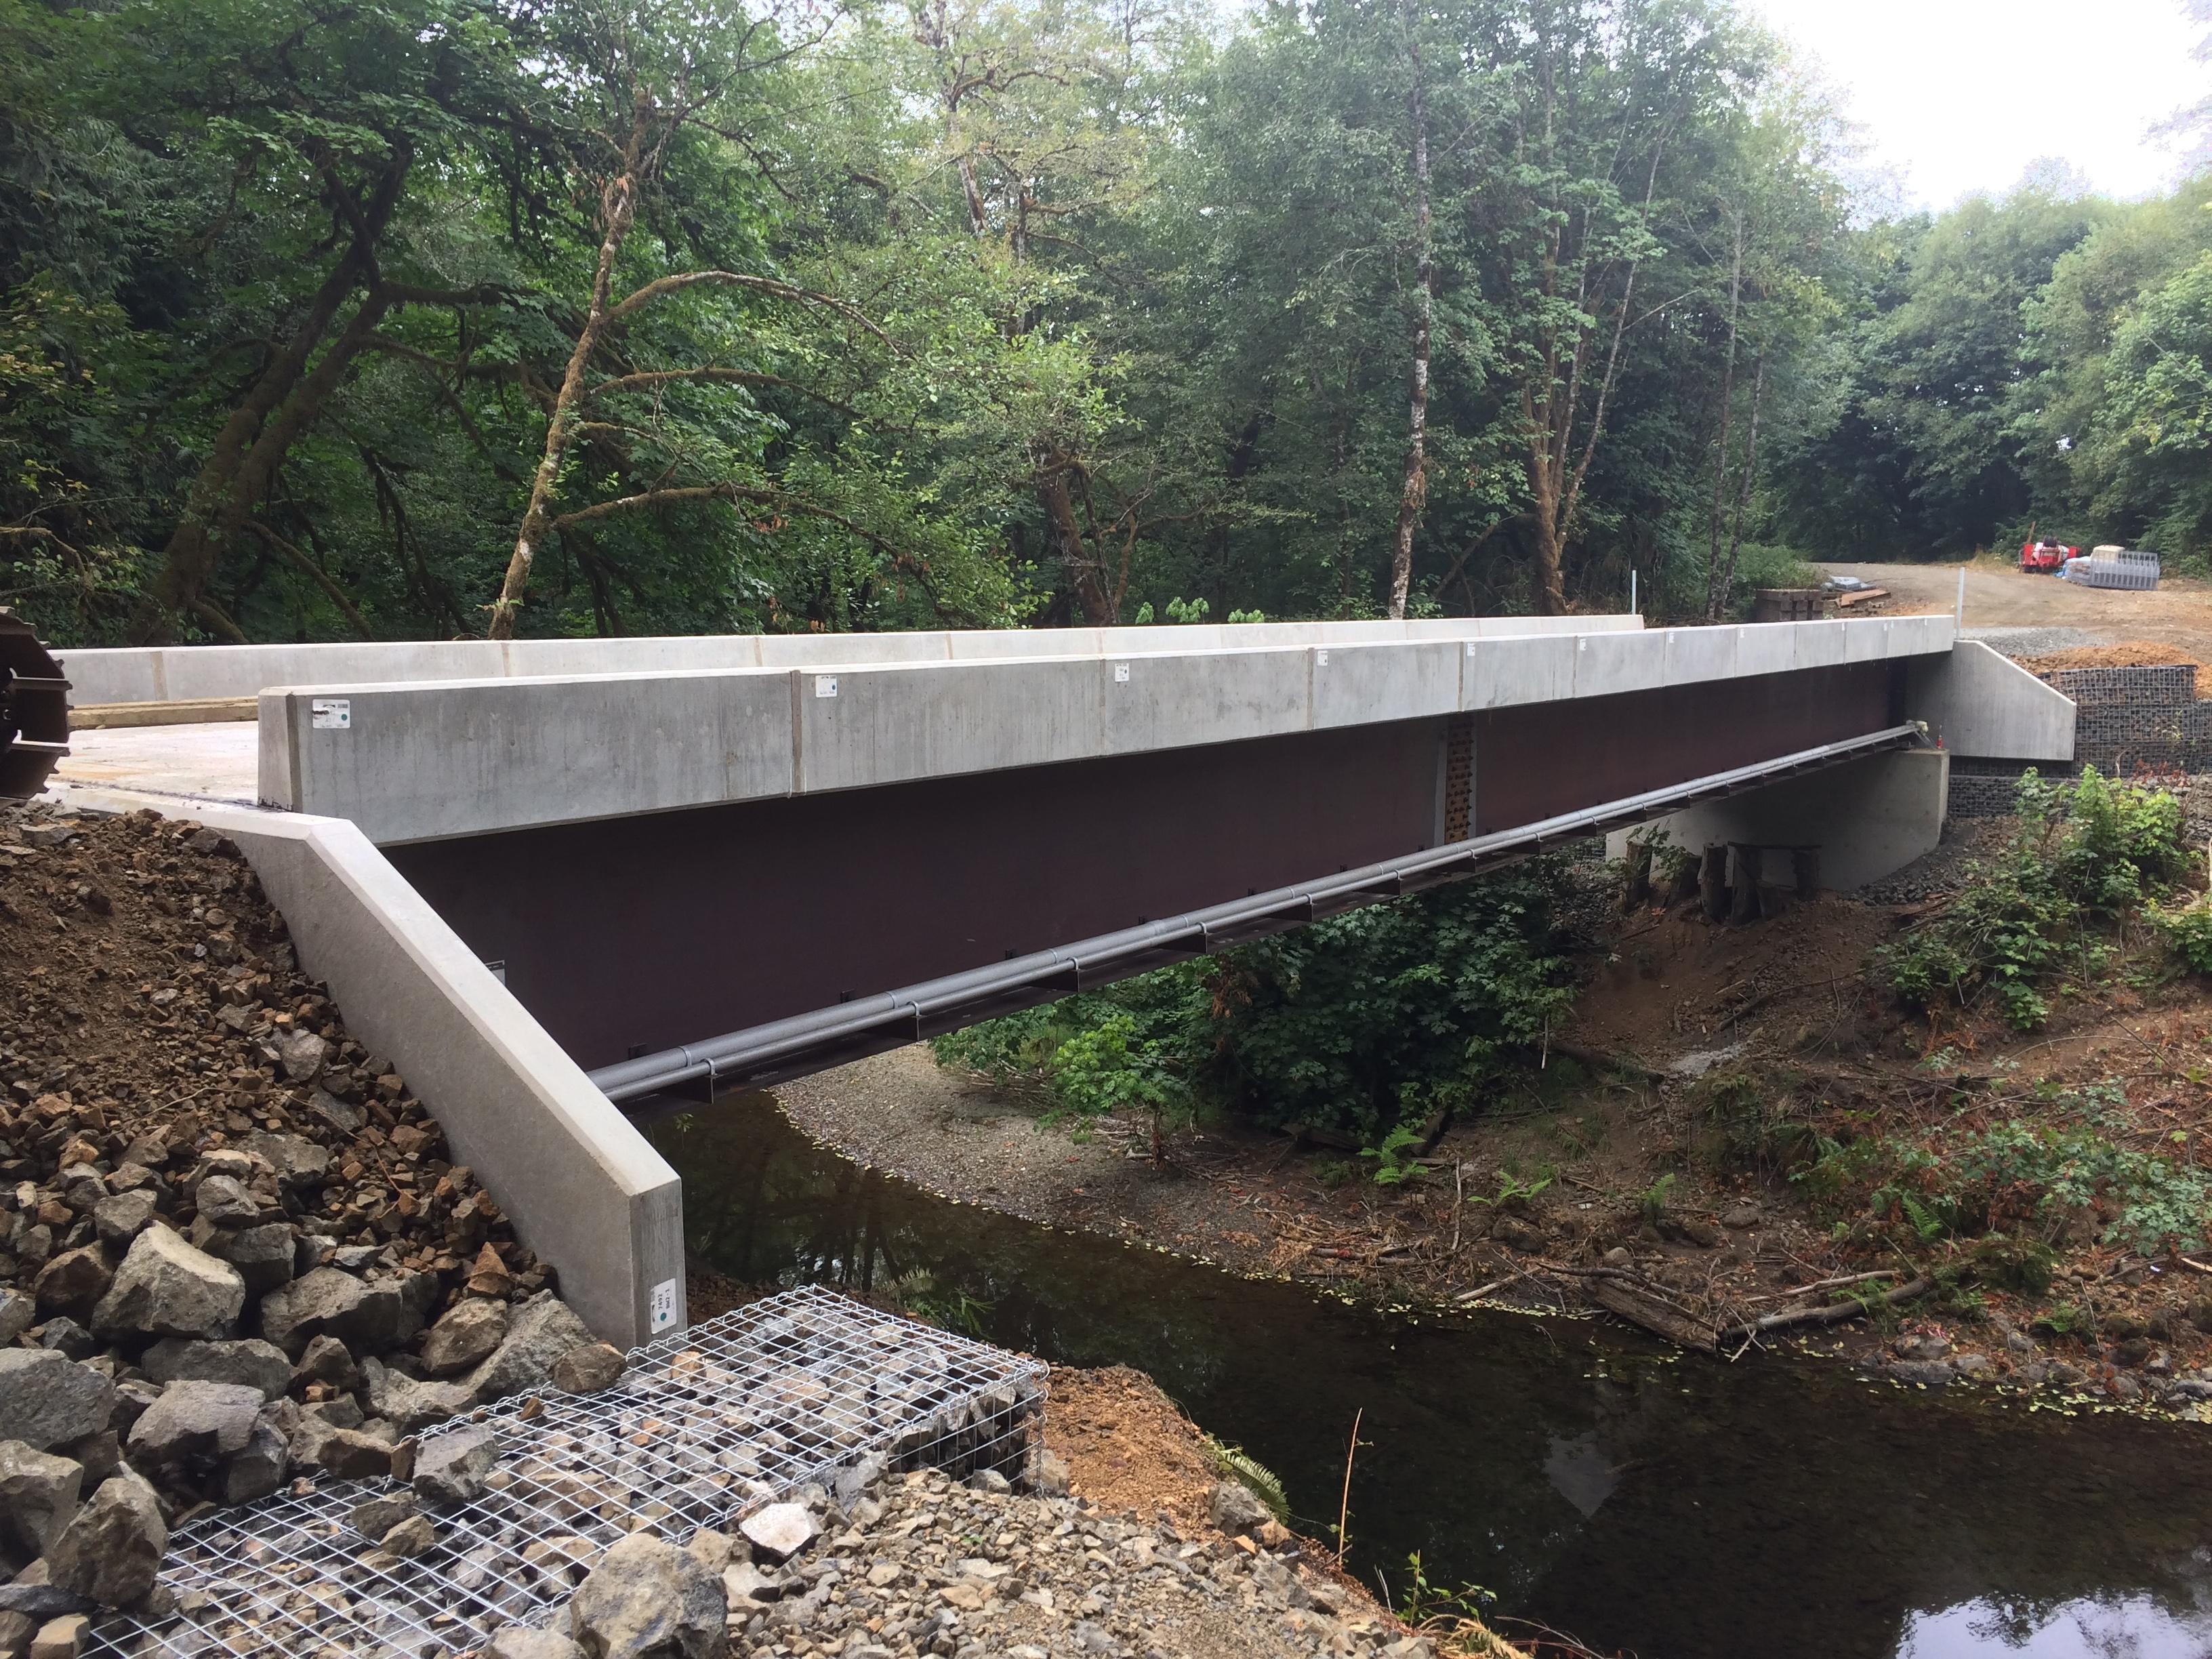 Weyerhaeuser Pe Ell Division – Forks Creek A-Line #1 - Rapid